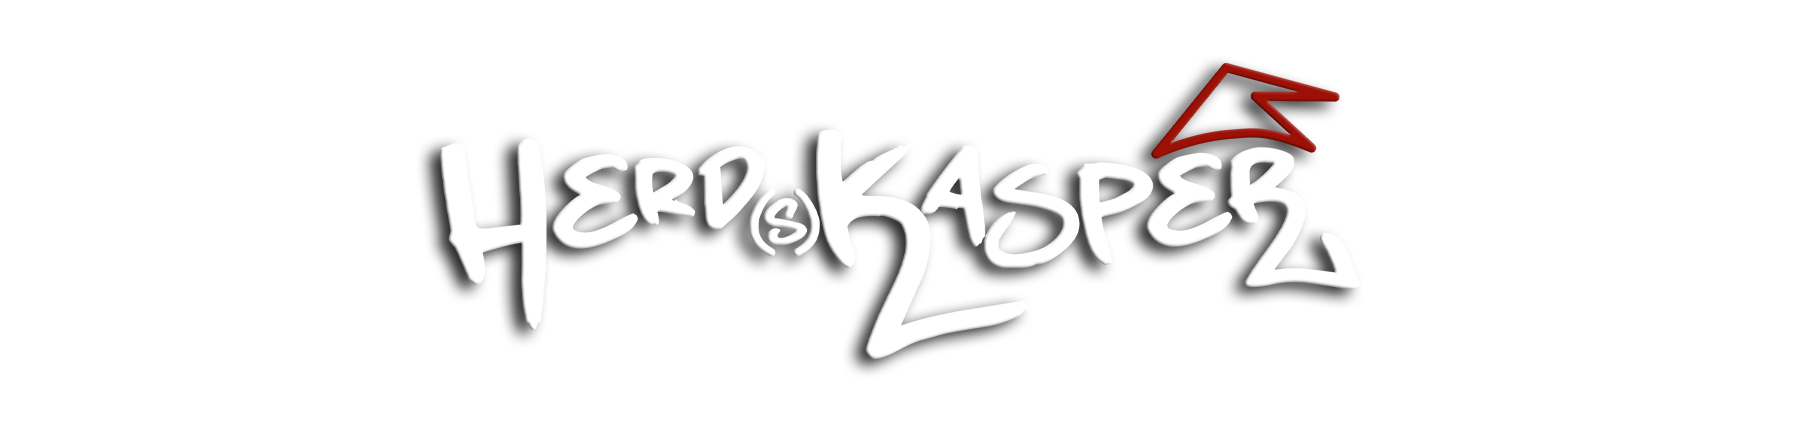 Herd(s)Kasper